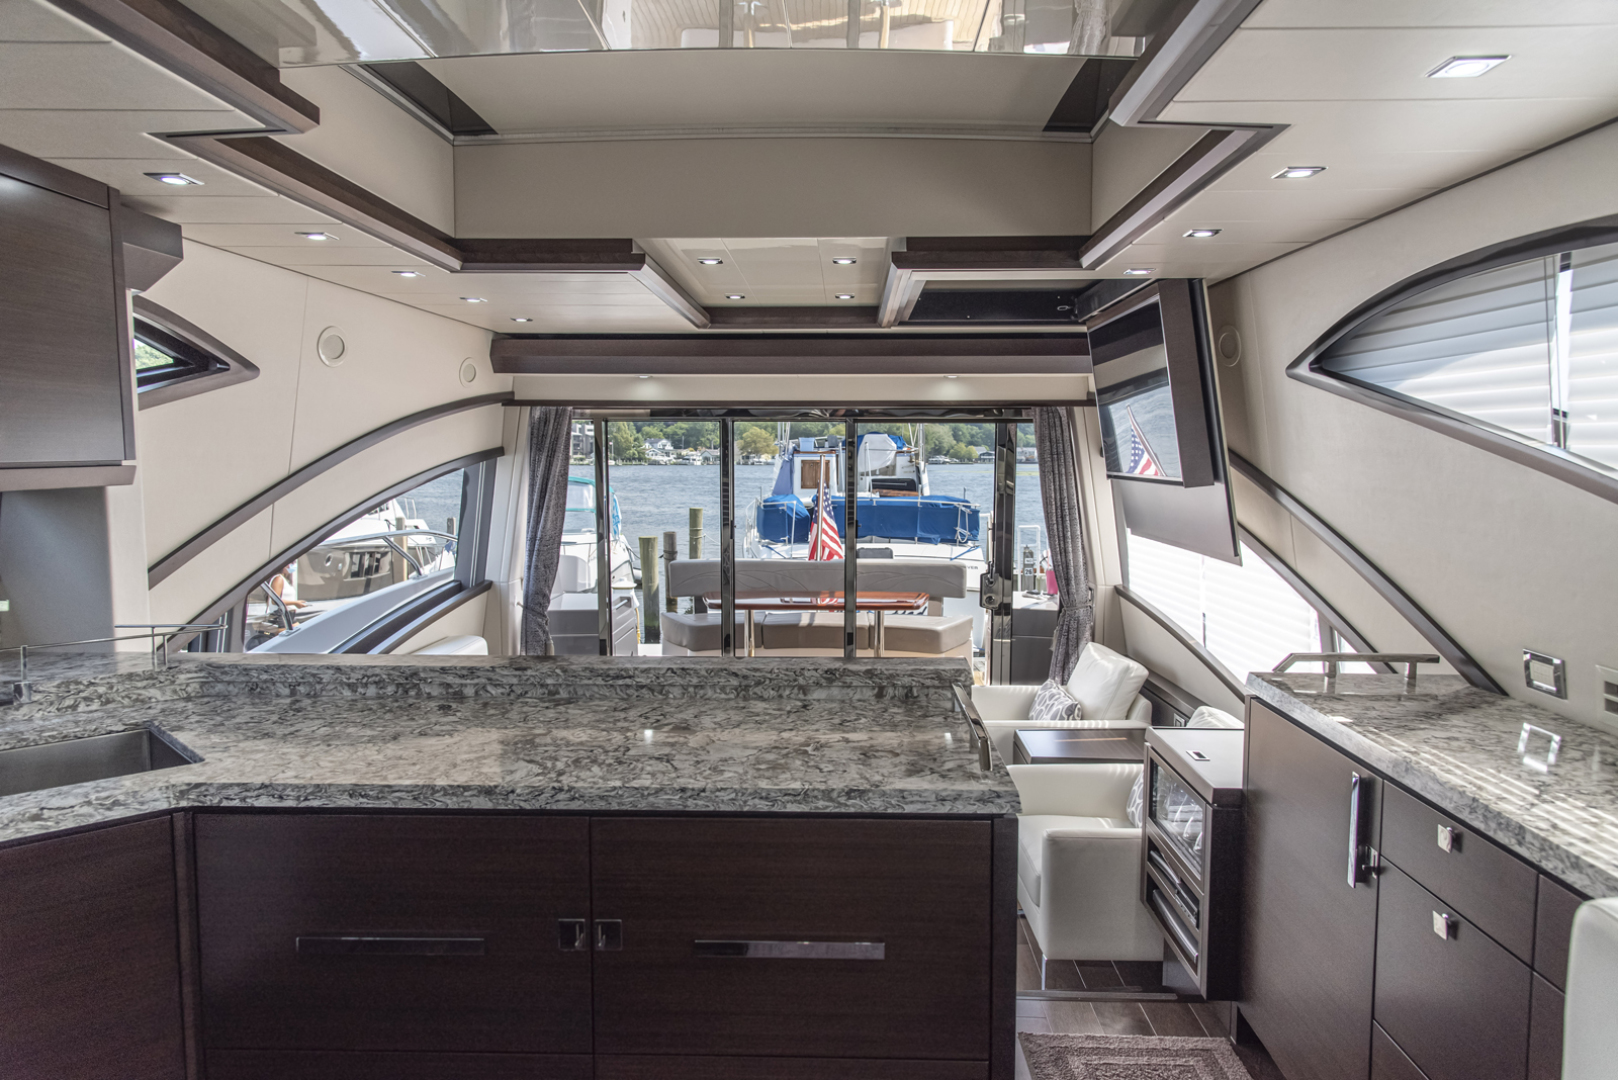 Neptunus-Motor Yacht Express 2018-LIQUID WISDOM Grand Haven-Michigan-United States-Galley looking aft-1484966 | Thumbnail